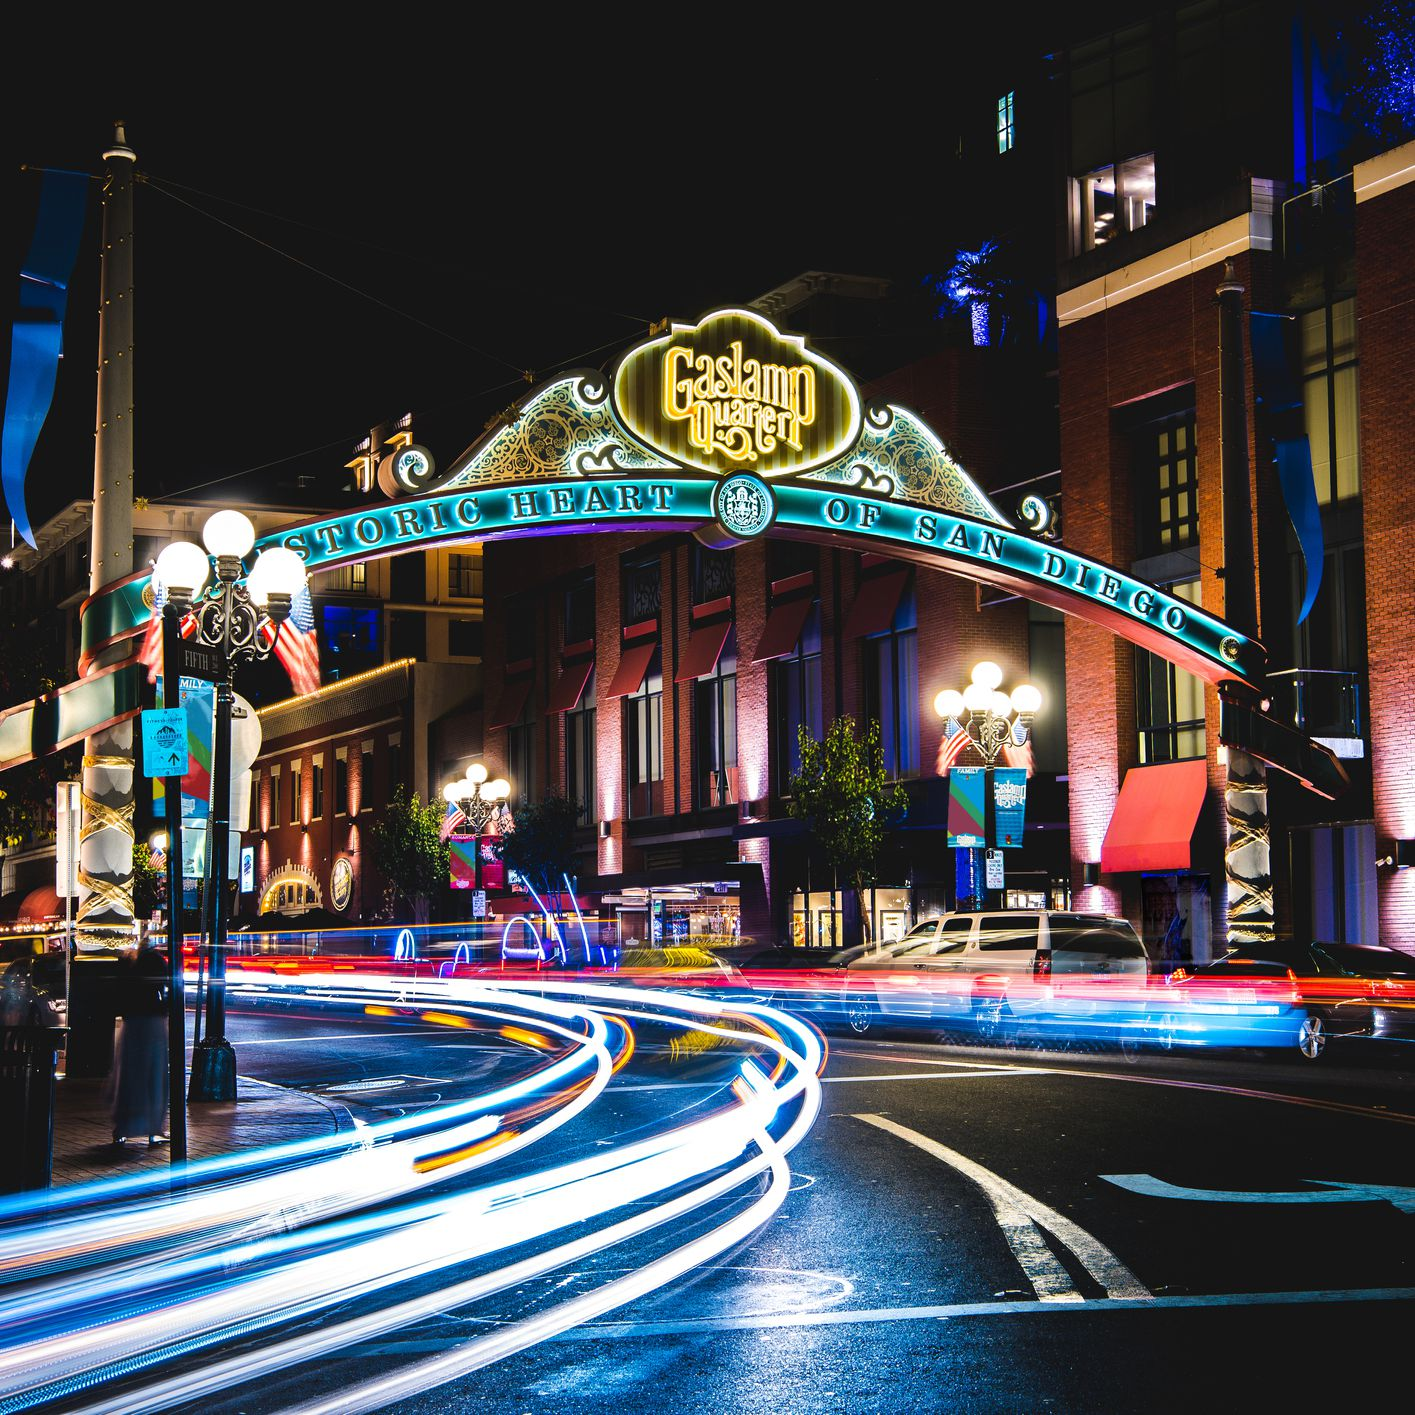 Nightlife in San Diego: Best Bars, Clubs, & More